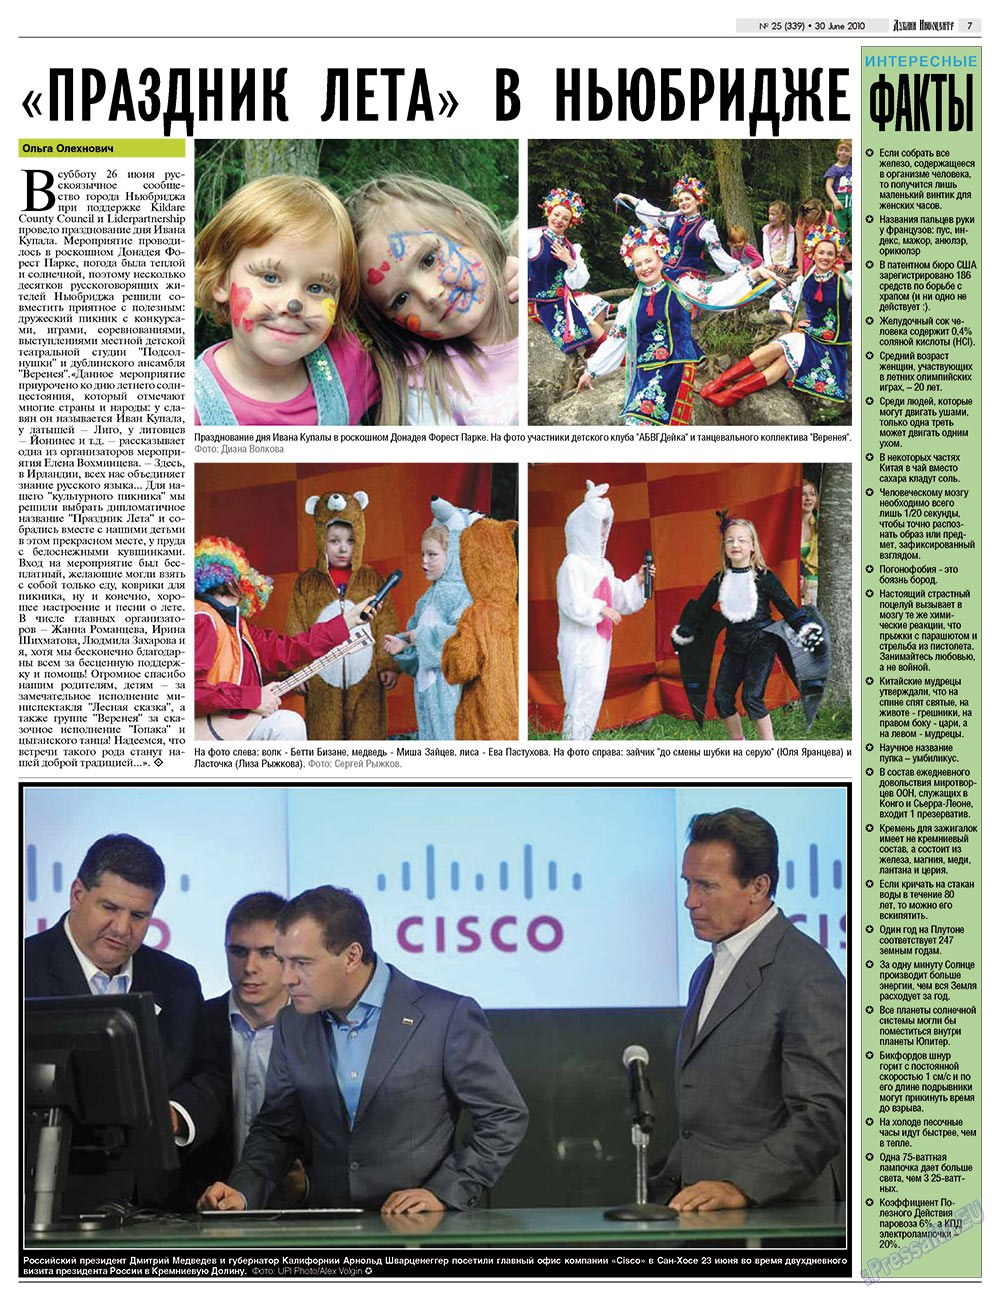 Дублин инфоцентр (газета). 2010 год, номер 25, стр. 7